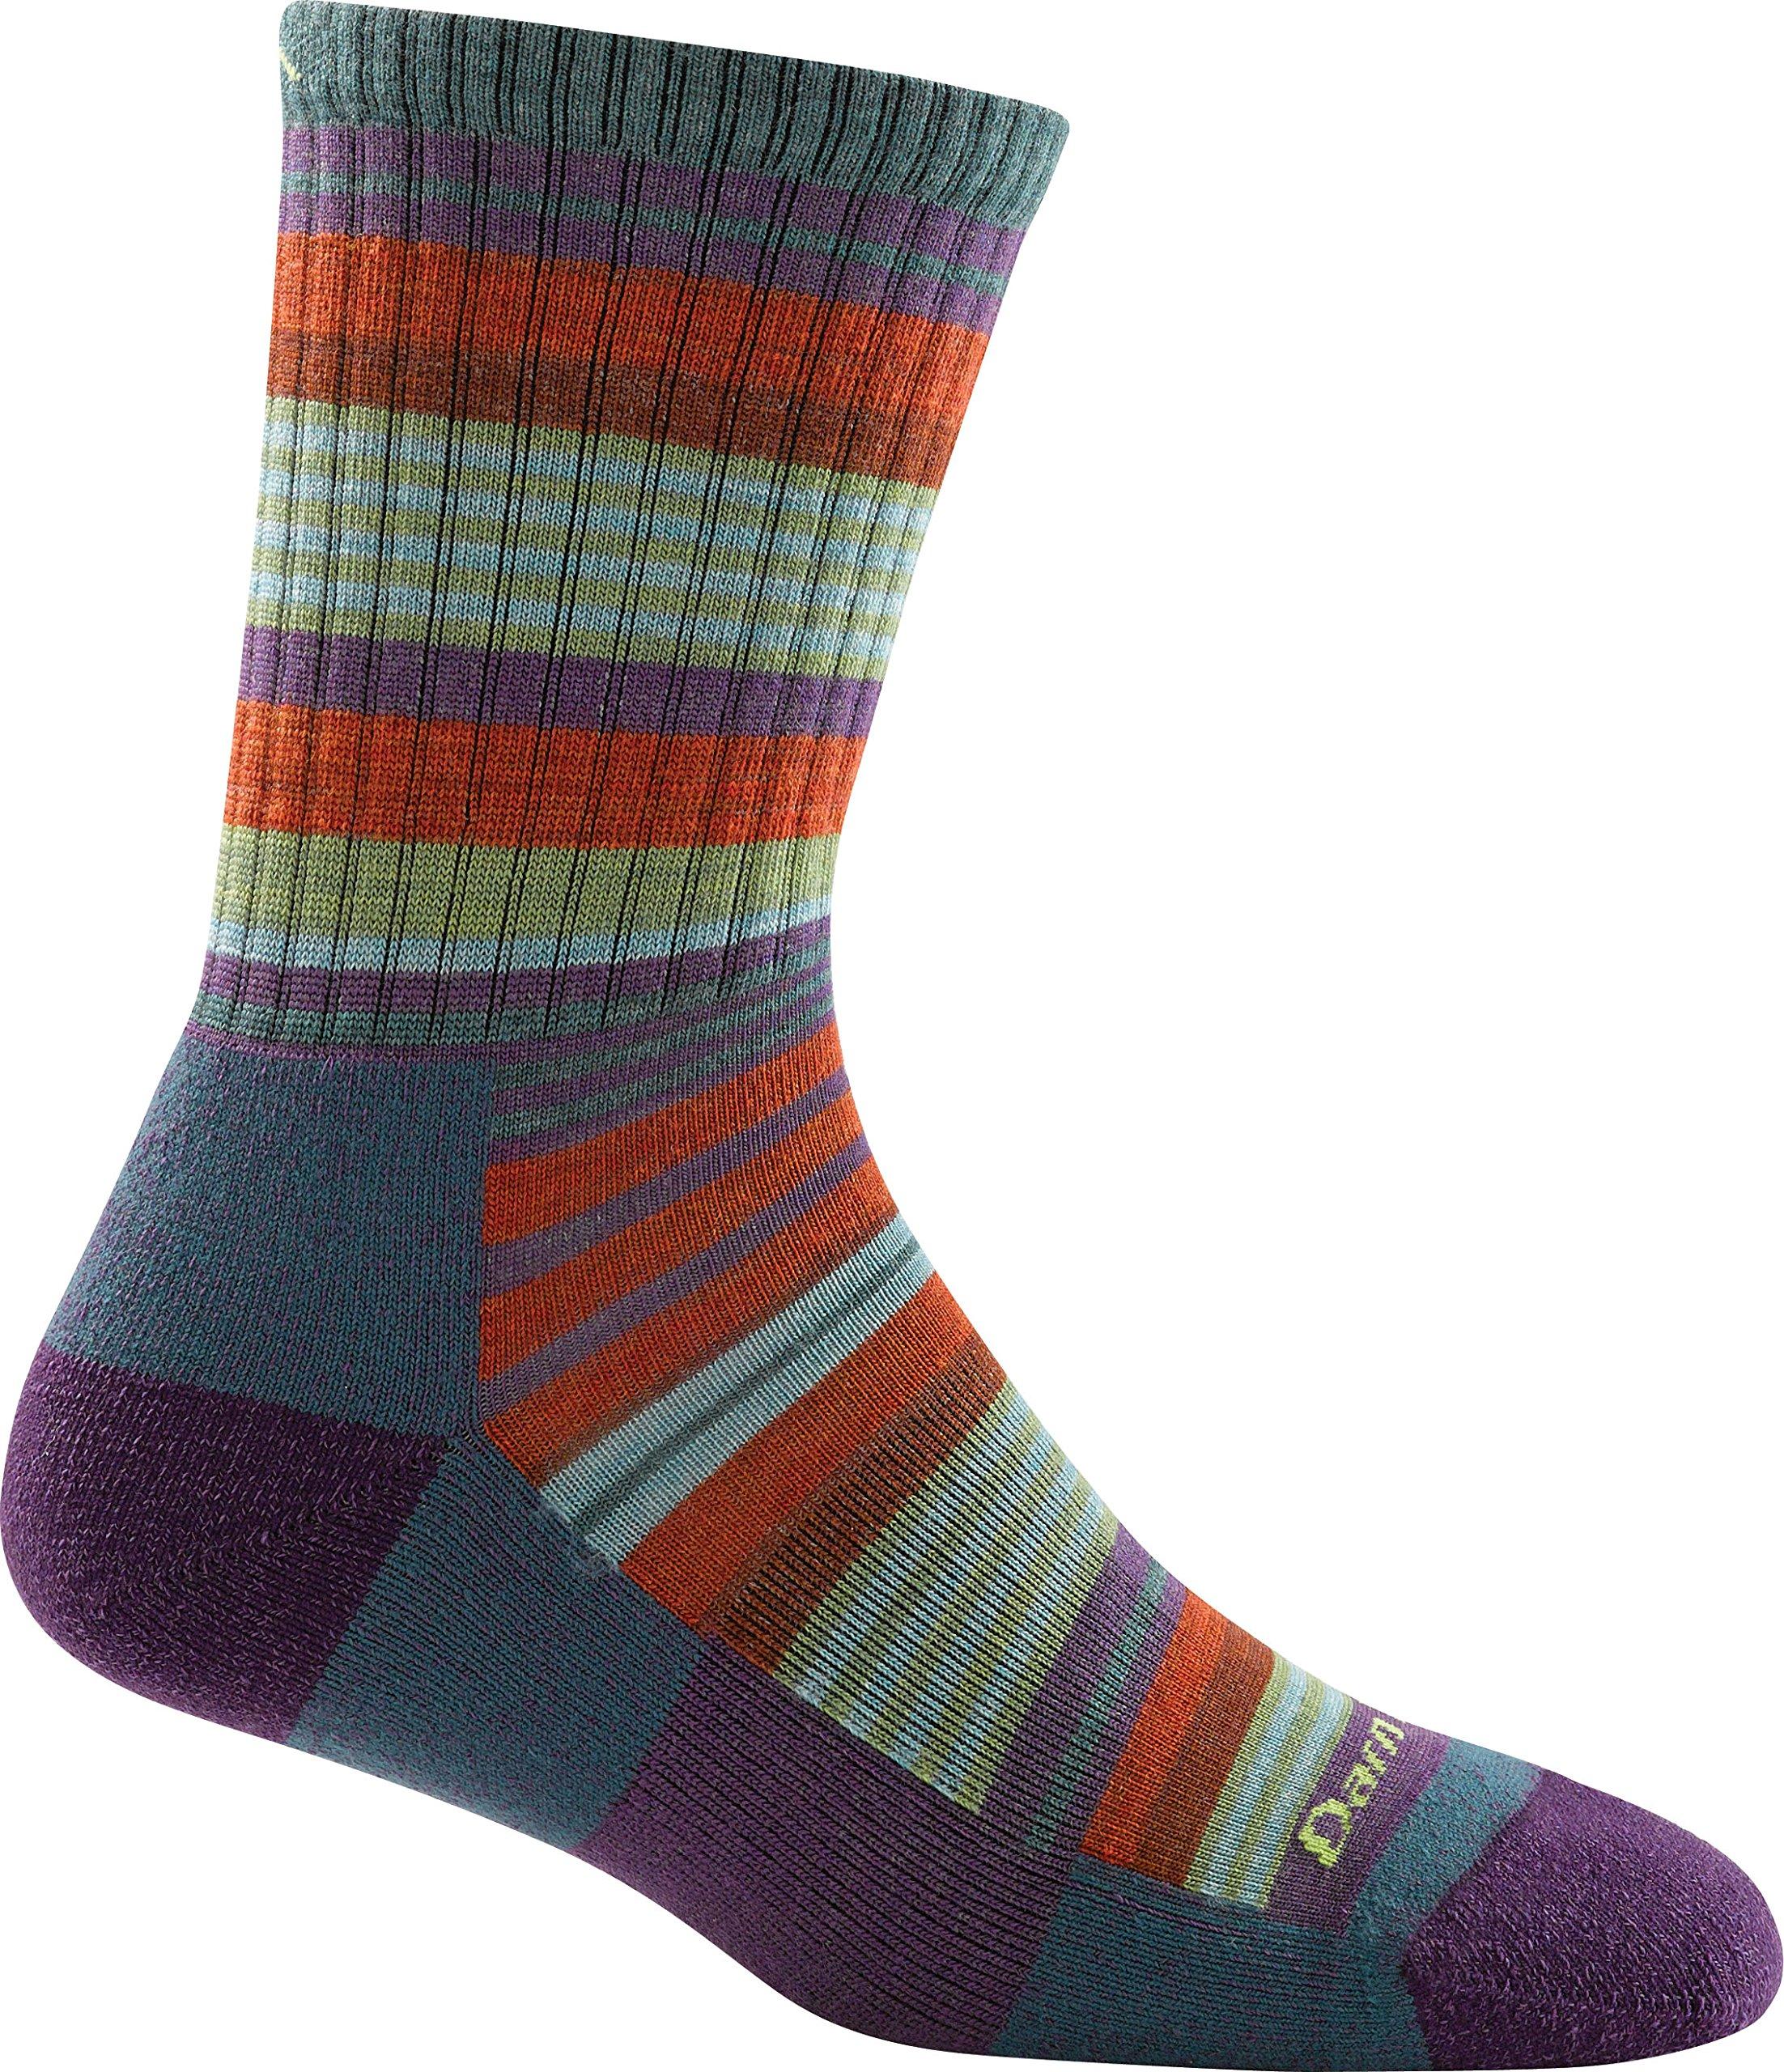 Darn Tough Vermont Women's Sierra Stripe Micro Light Cushion Socks, Teal, M